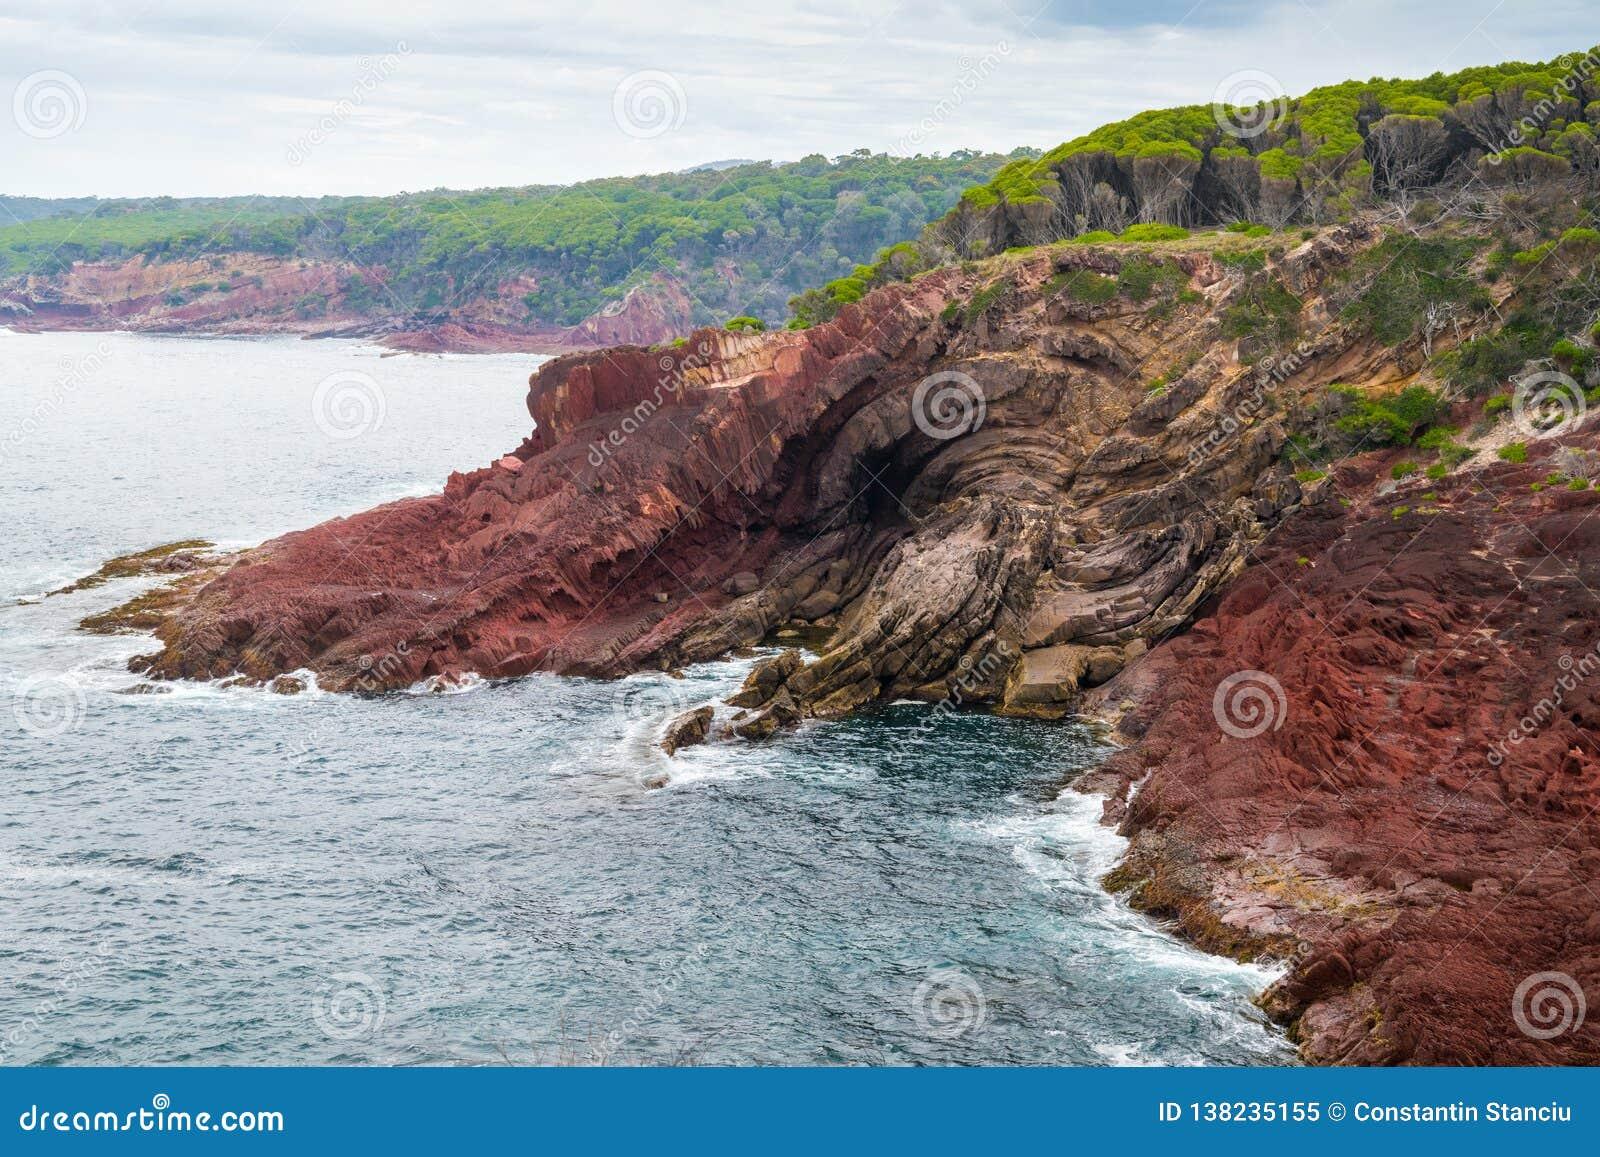 Marine red folded rocks in Ben Boyd National Park